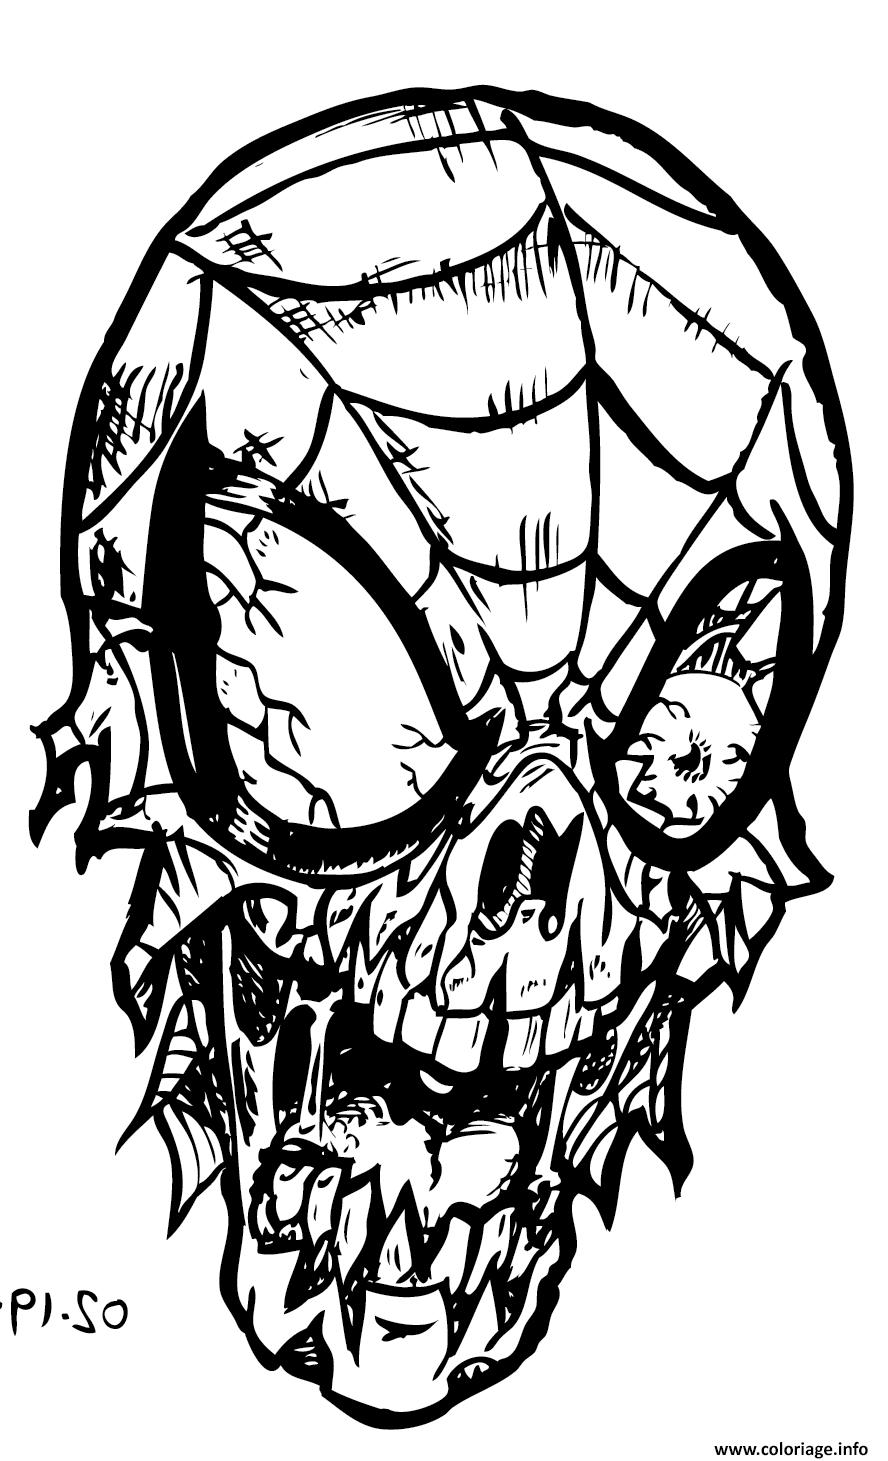 Coloriage Spiderman Zombie dessin